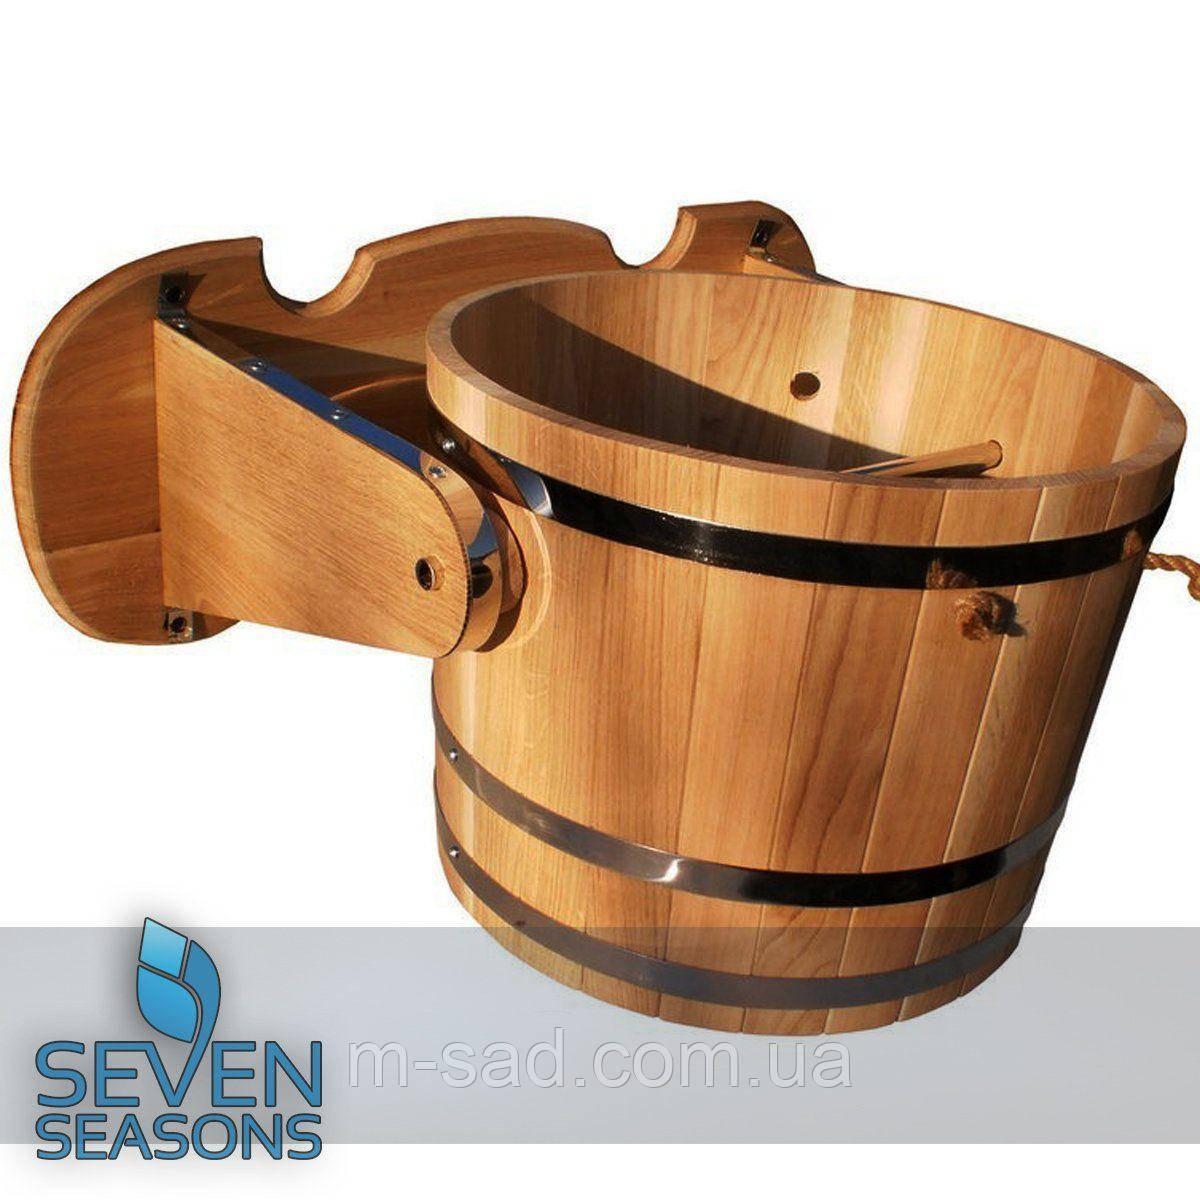 Ведро-водопад для бани Seven Seasons™, 10 литров